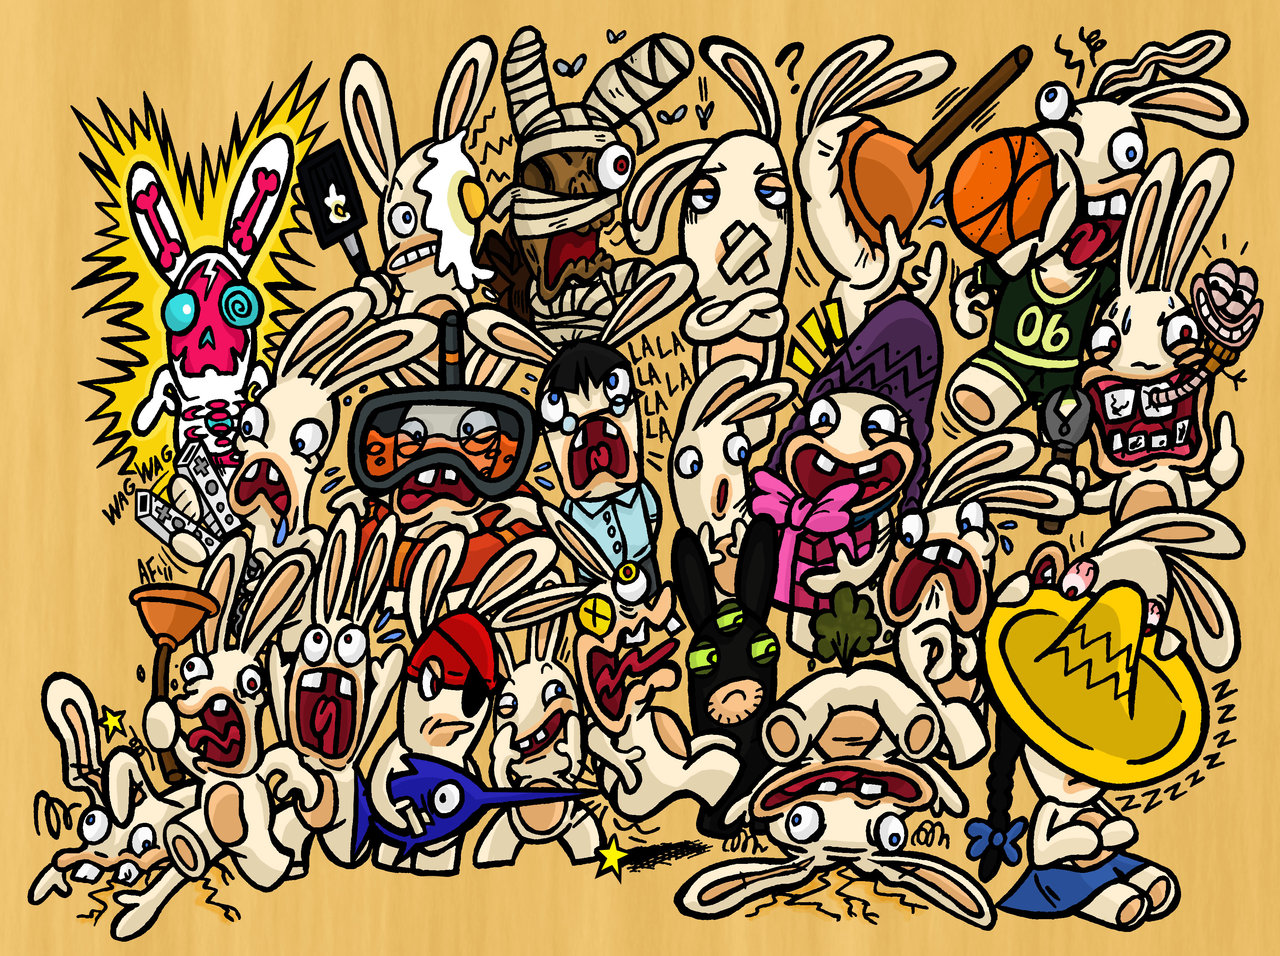 Drawn rabbid doodle By Page on GagaMan Rabbids